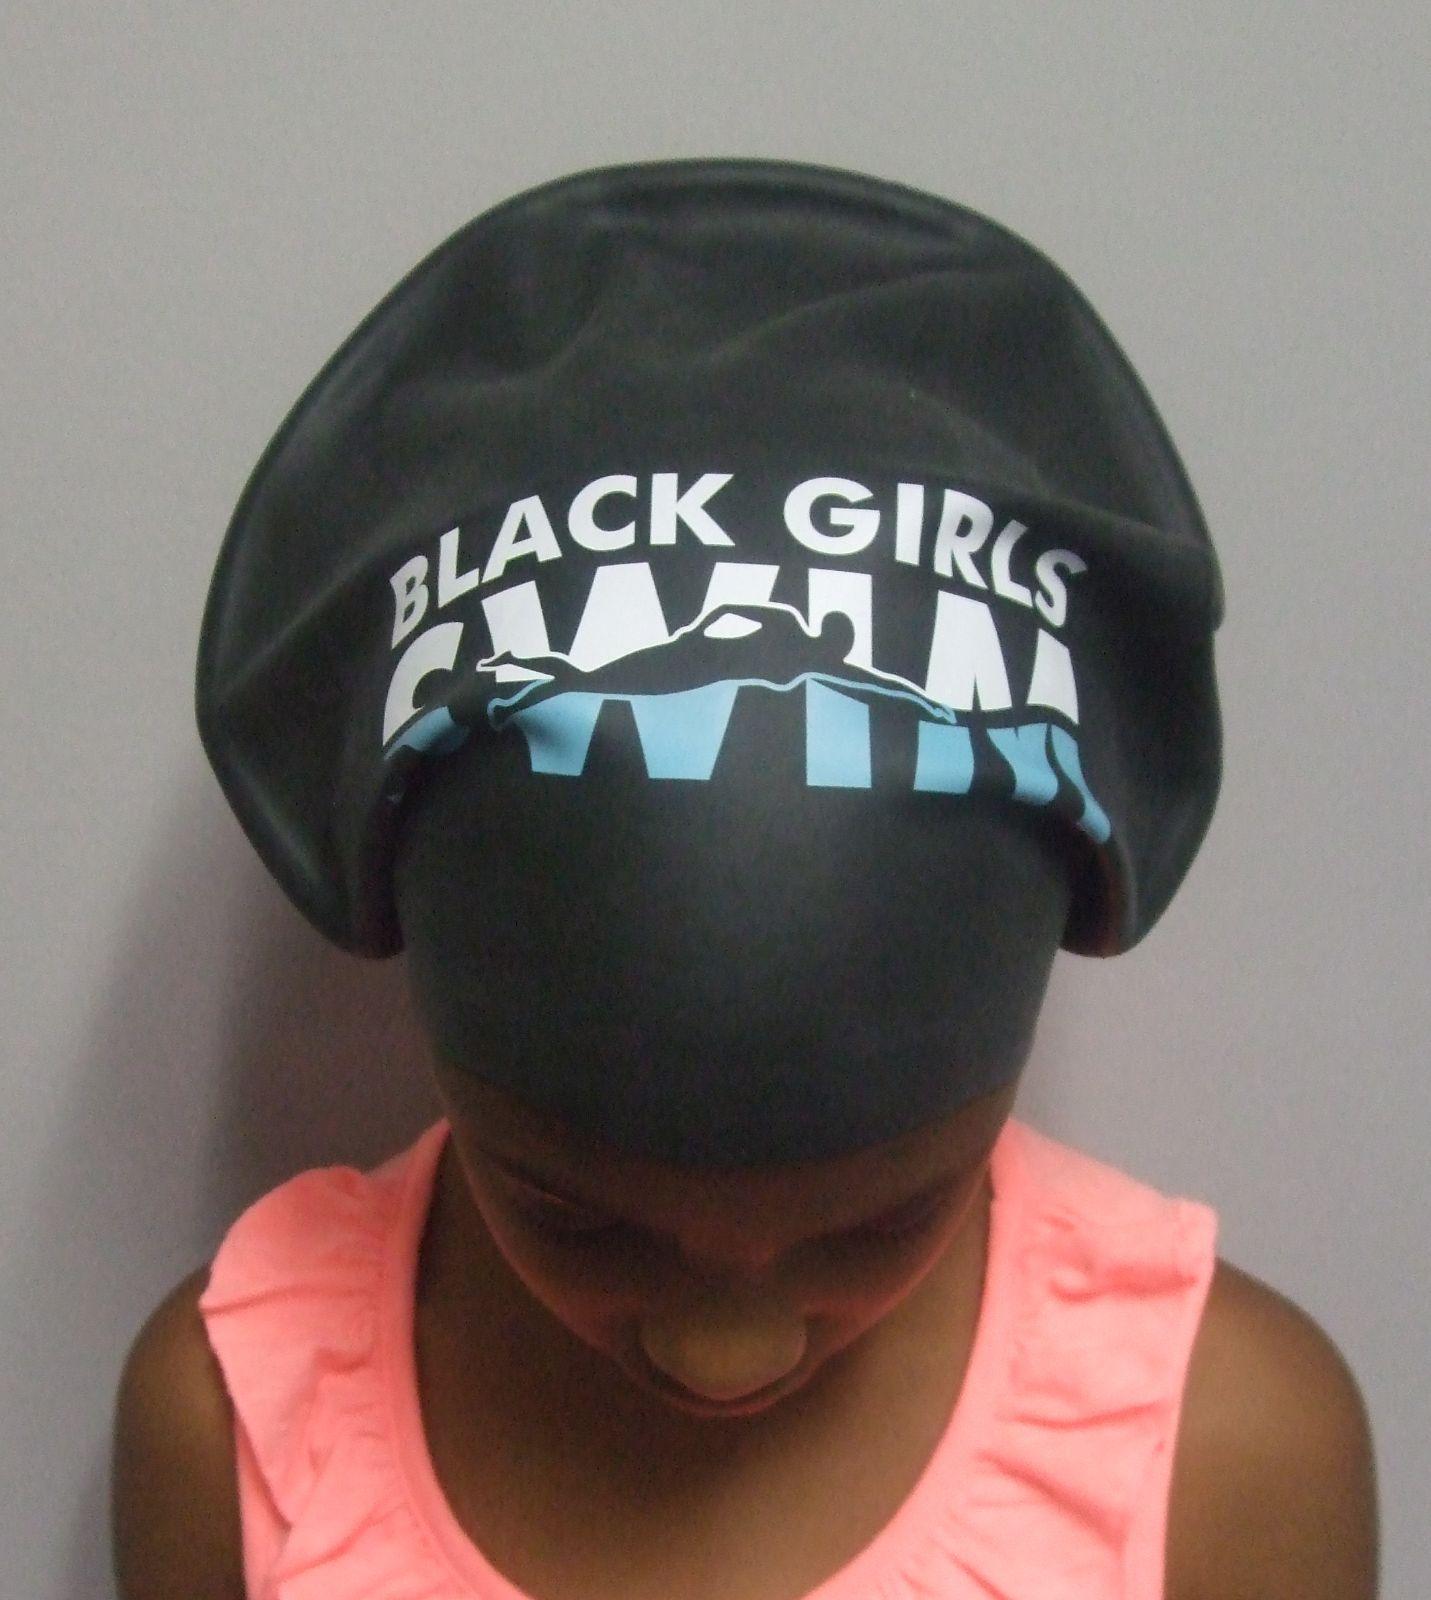 Xl Black Girls Swim Cap For Long Hair, Locks And